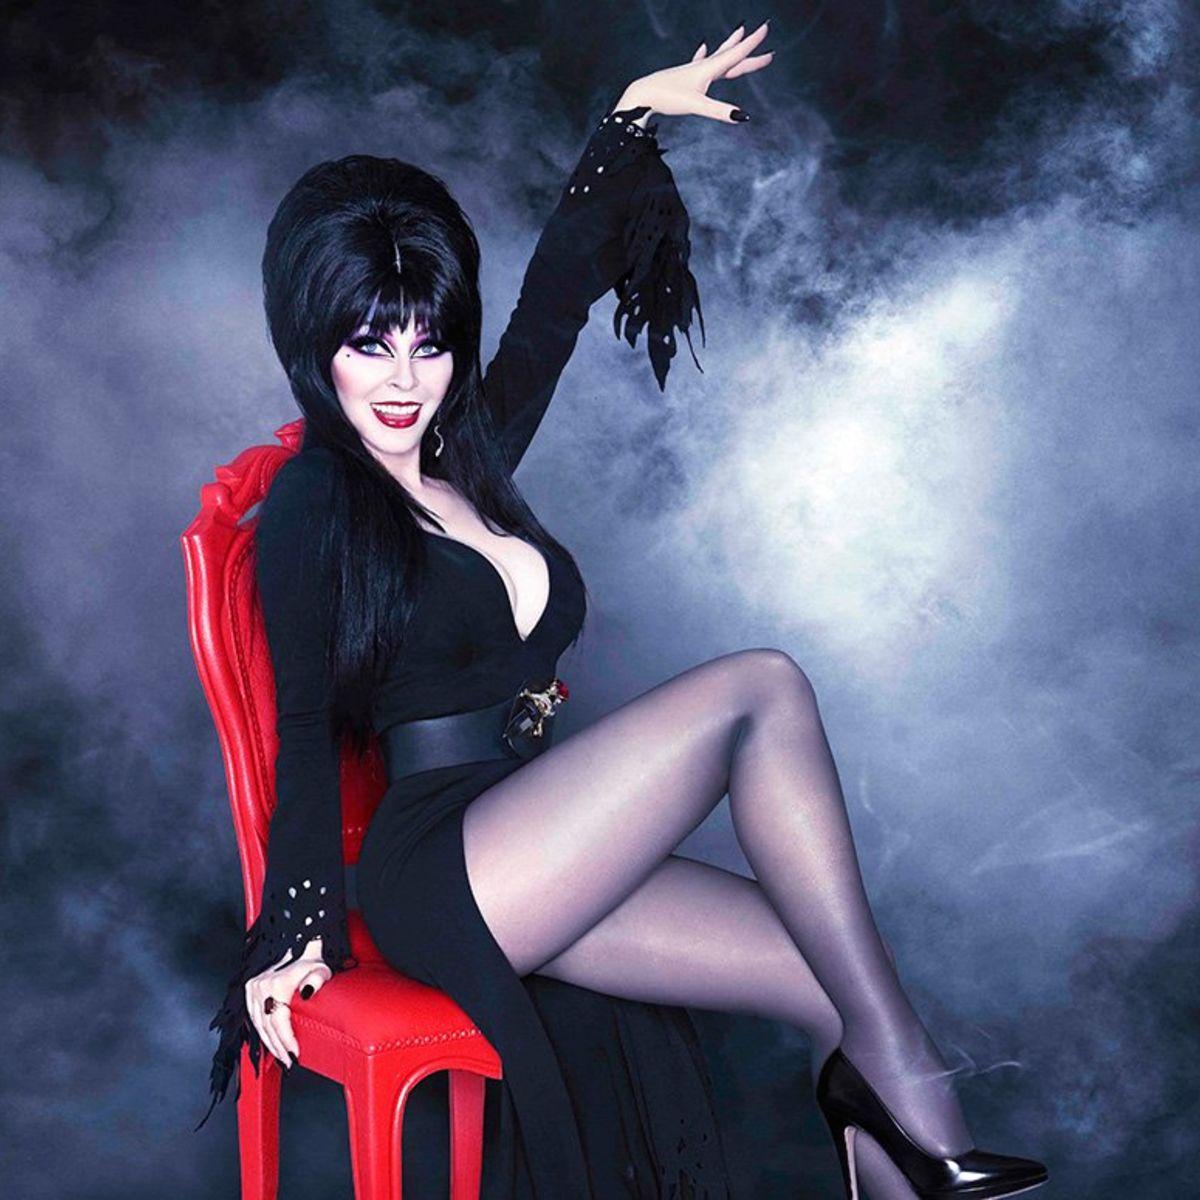 elvira-mistress-of-the-dark-halloween-2015.jpg